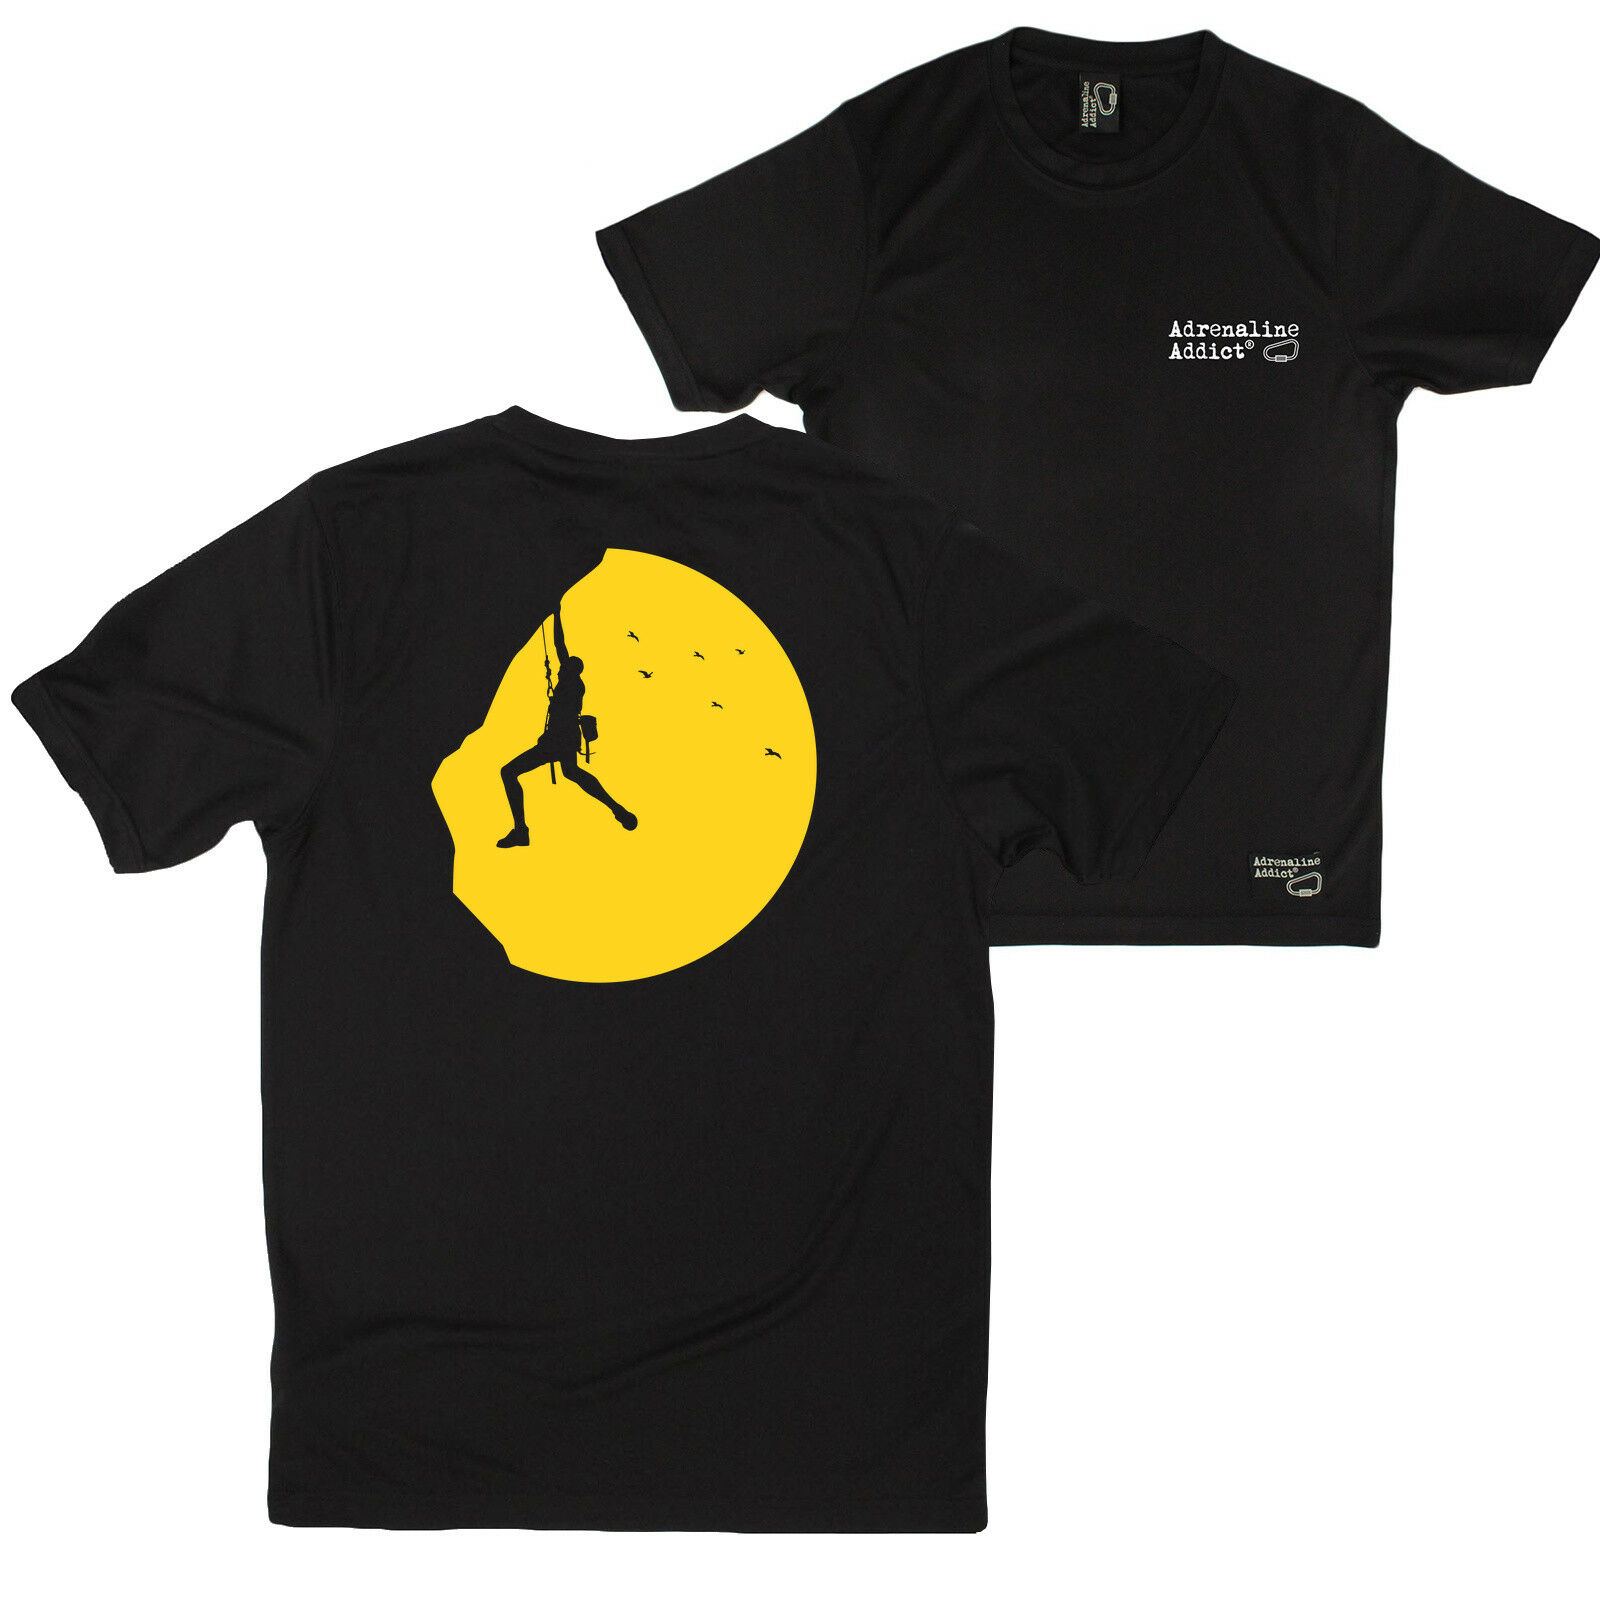 FB Rock Climbing Tee - Sunset Climber - Novelty Dry Fit Performance T-Shirt